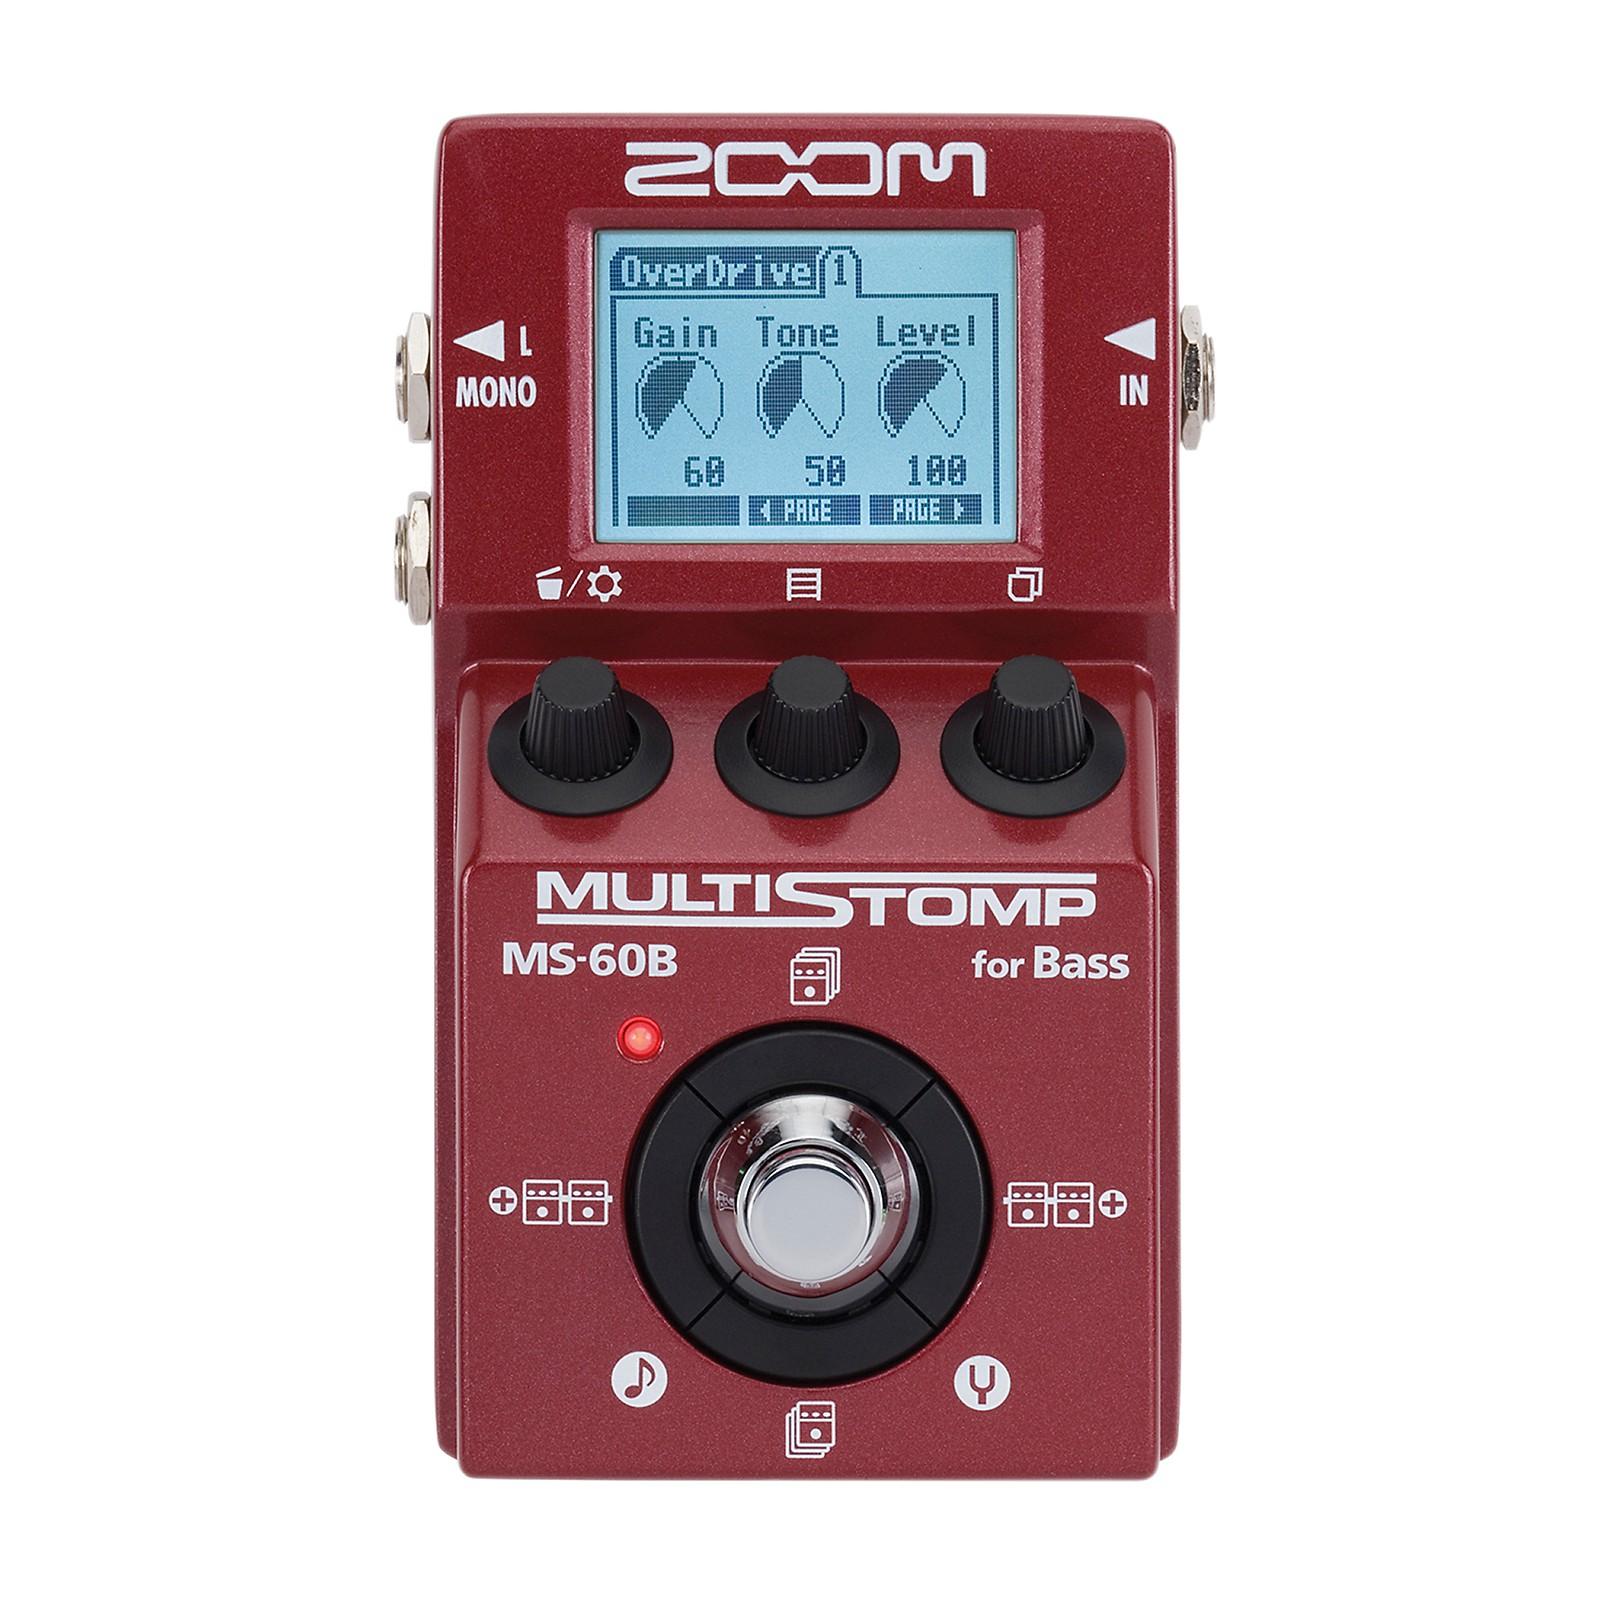 Zoom MS-60B Multi-Stomp Bass Pedal